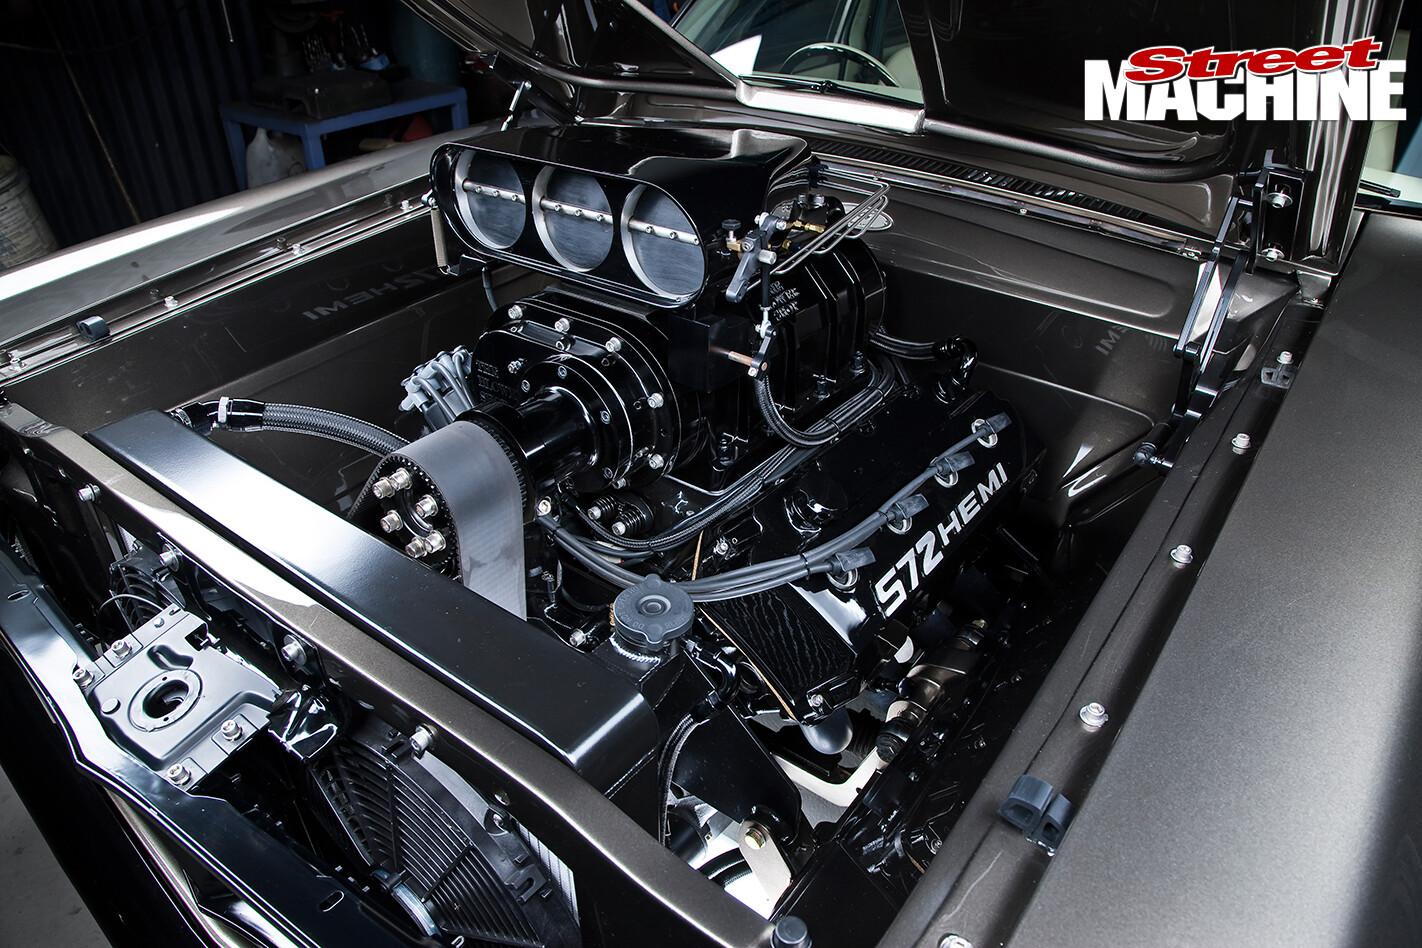 Ford -XY-Falcon -engine